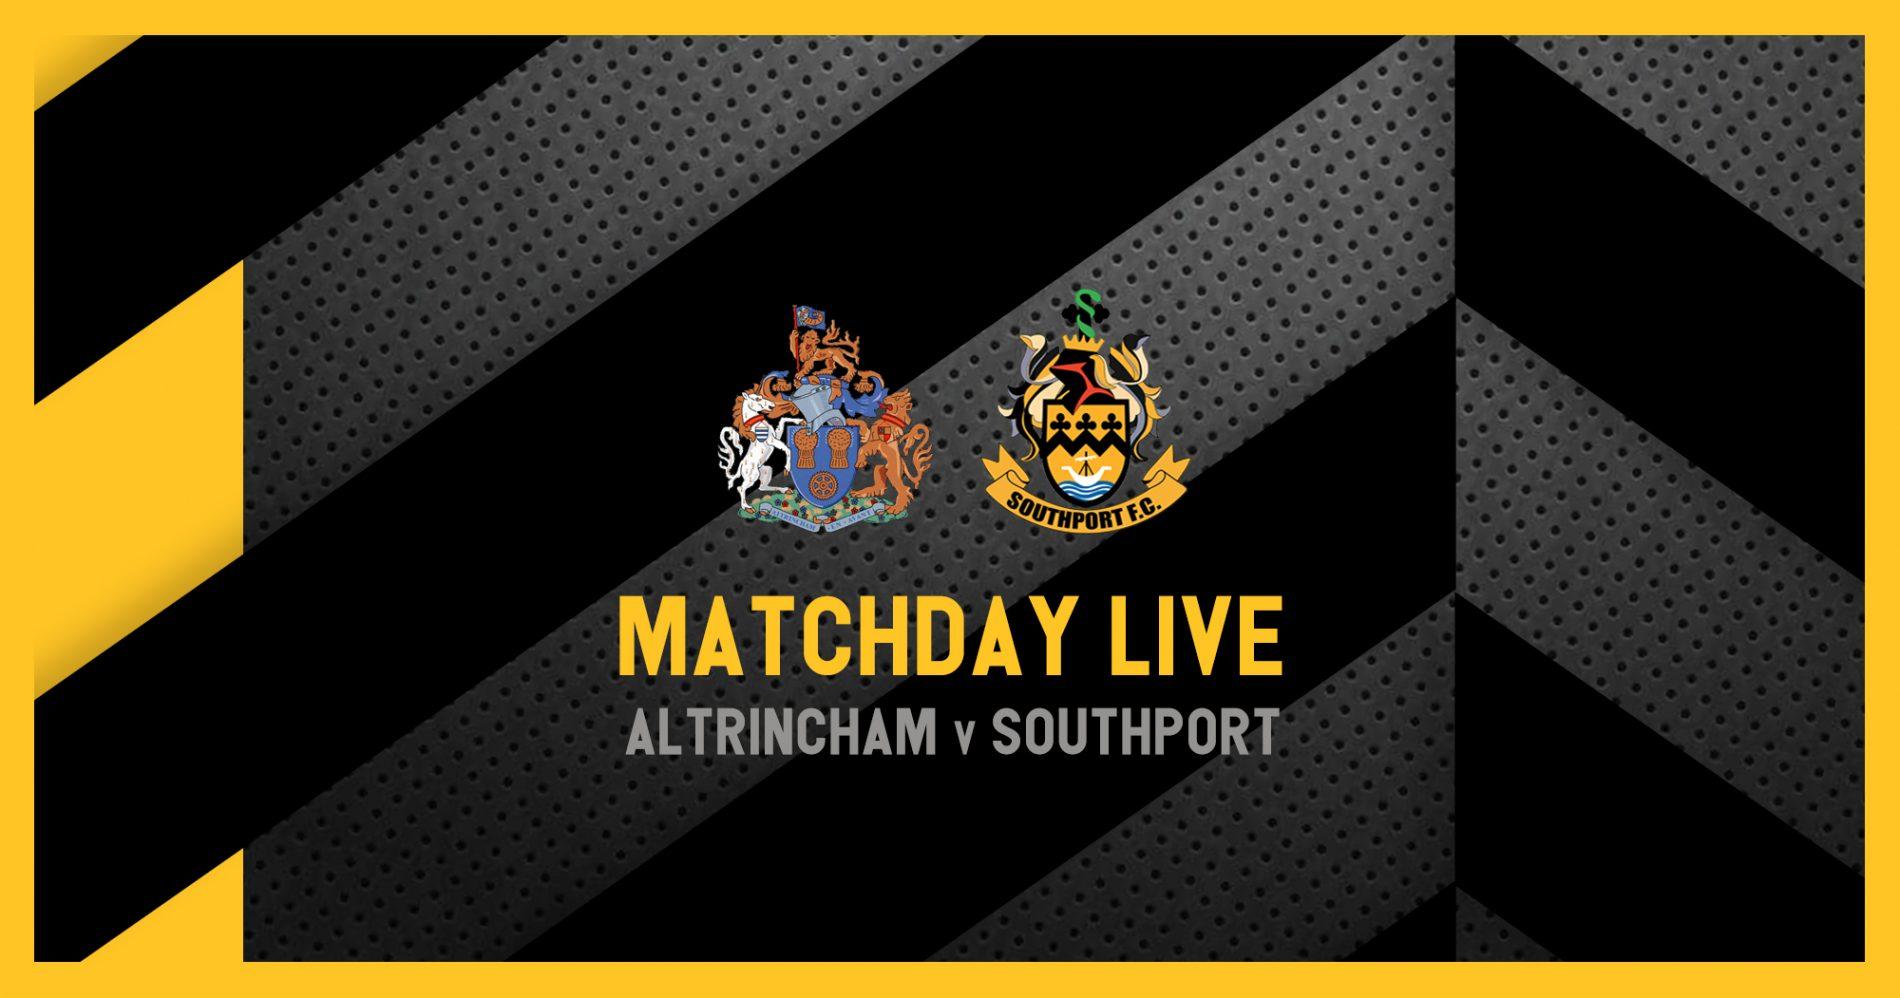 MATCHDAY LIVE | Altrincham v Southport